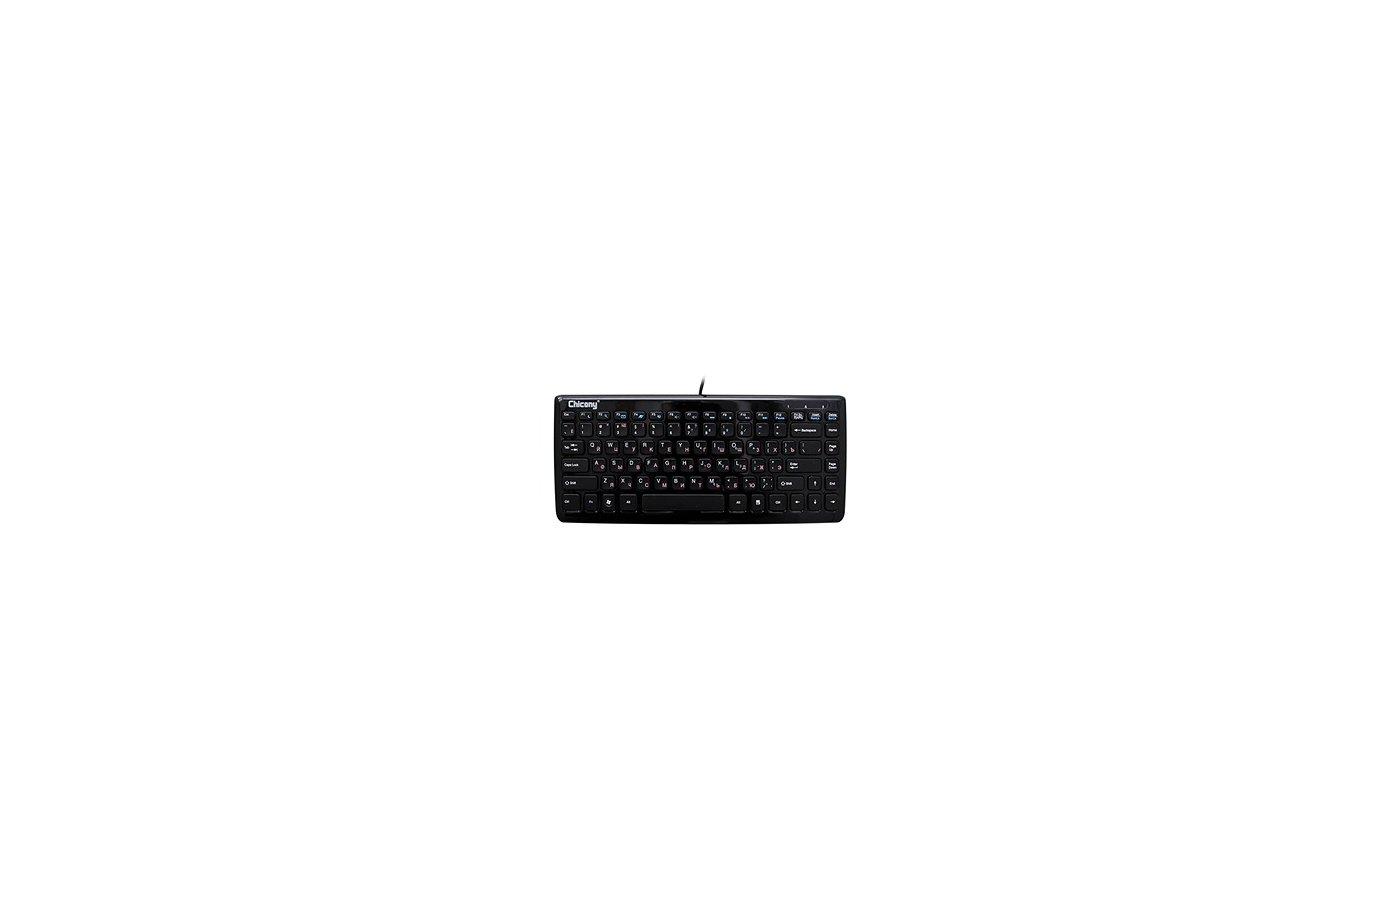 Клавиатура проводная Chicony KU-0903 USB glossy black multimedia internet super small